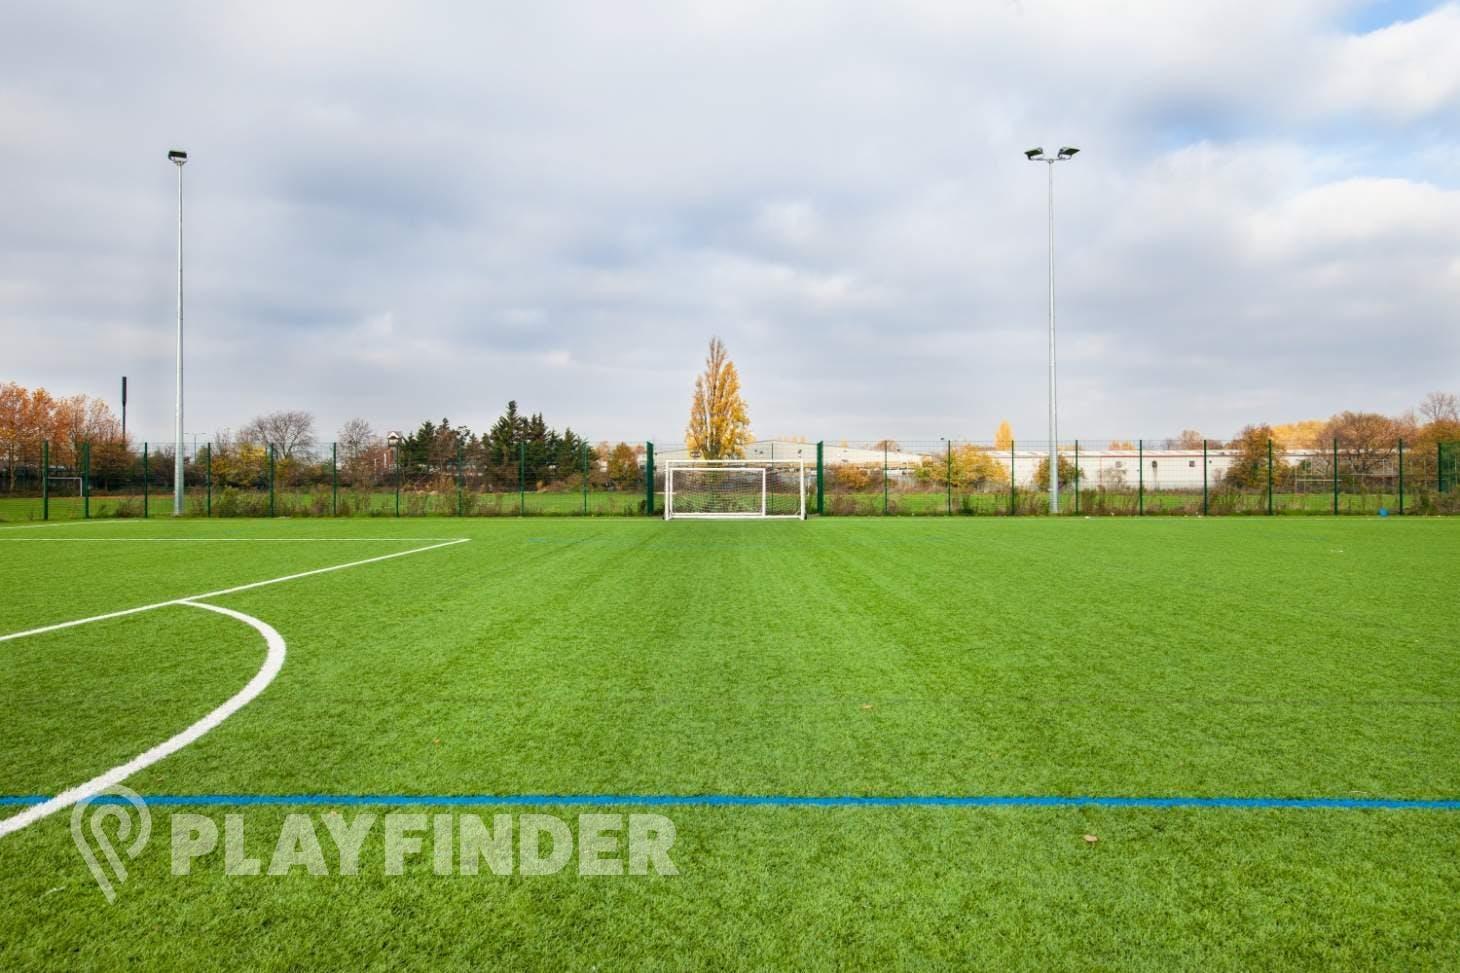 Salisbury Hall Playing Fields 7 a side | 3G Astroturf football pitch